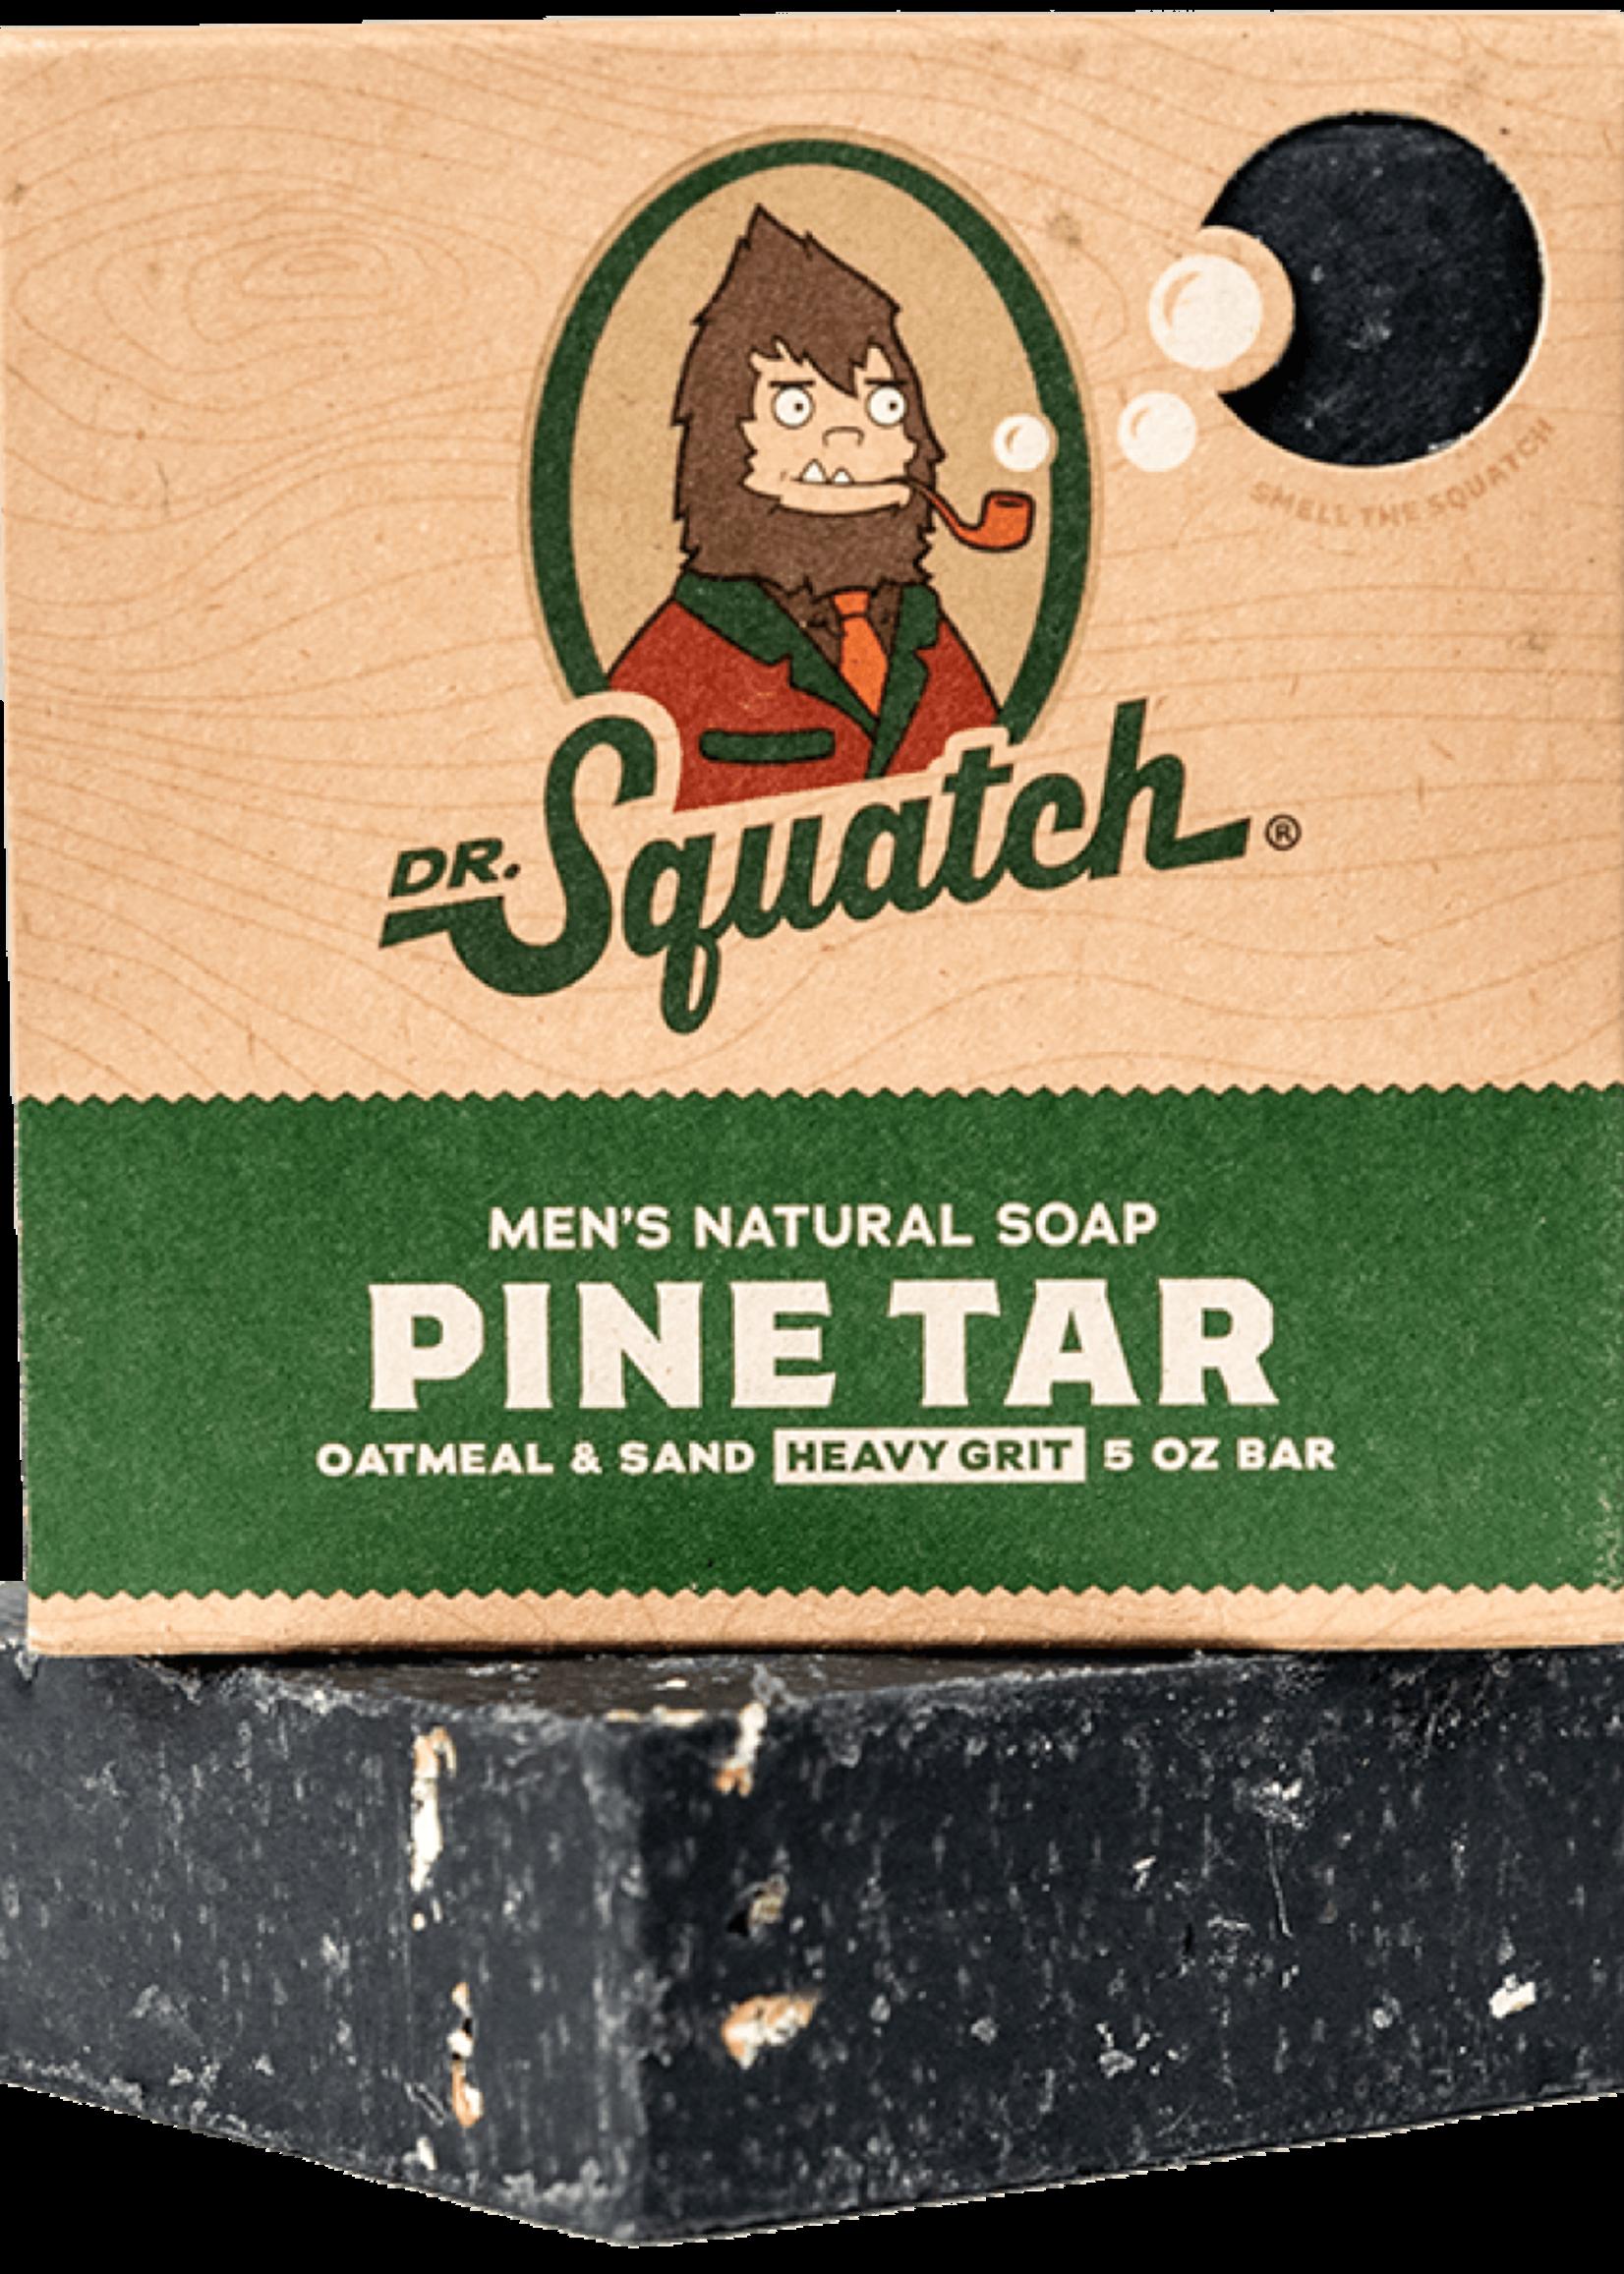 Pine Tar Heavy Grit Men's Soap